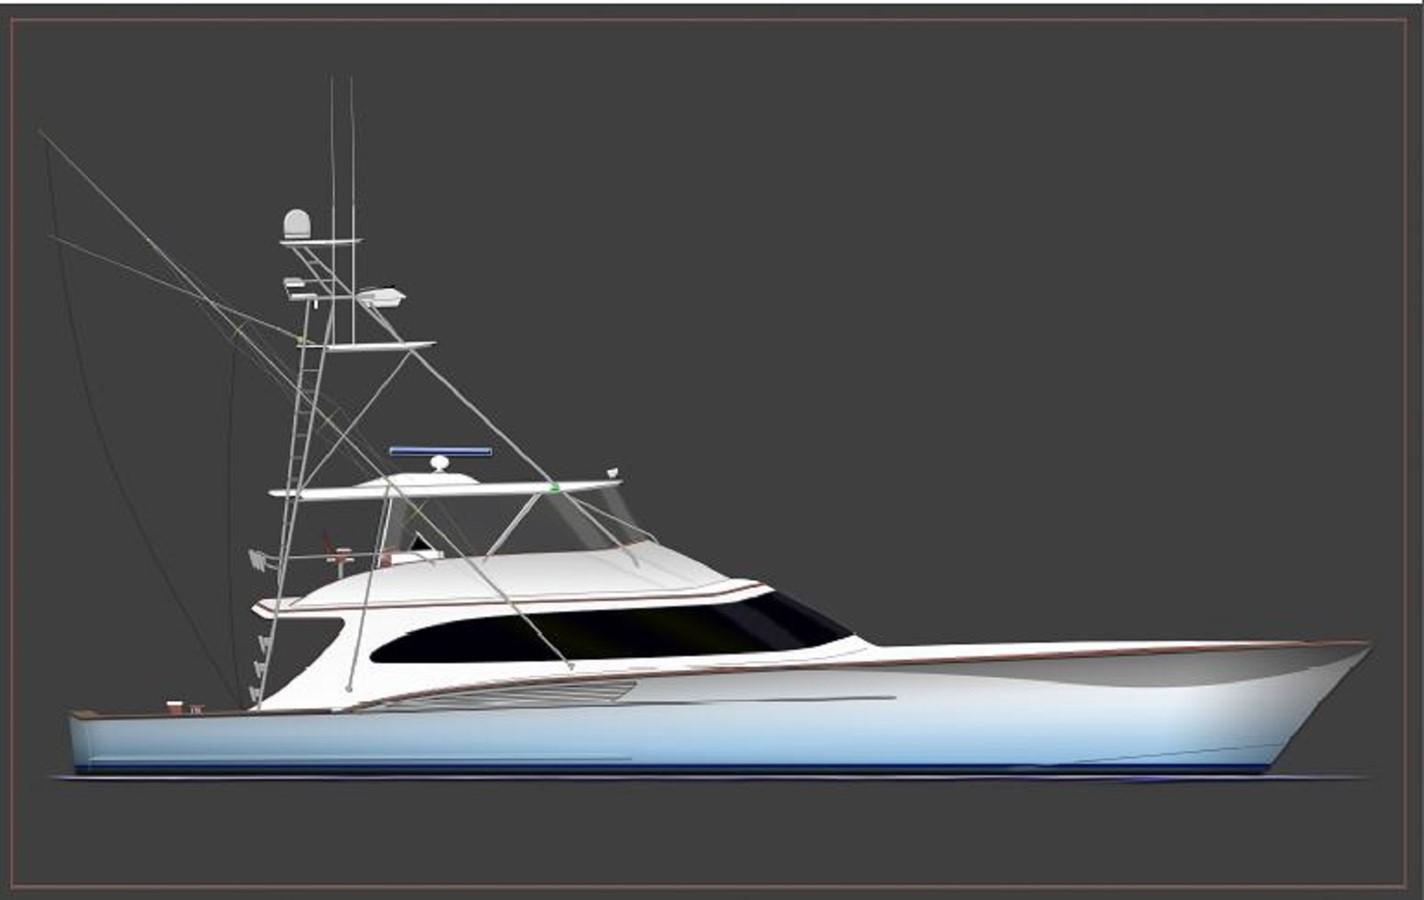 2019 JARRETT BAY Custom Carolina Convertible UNDER CONSTRUCTION For Sale